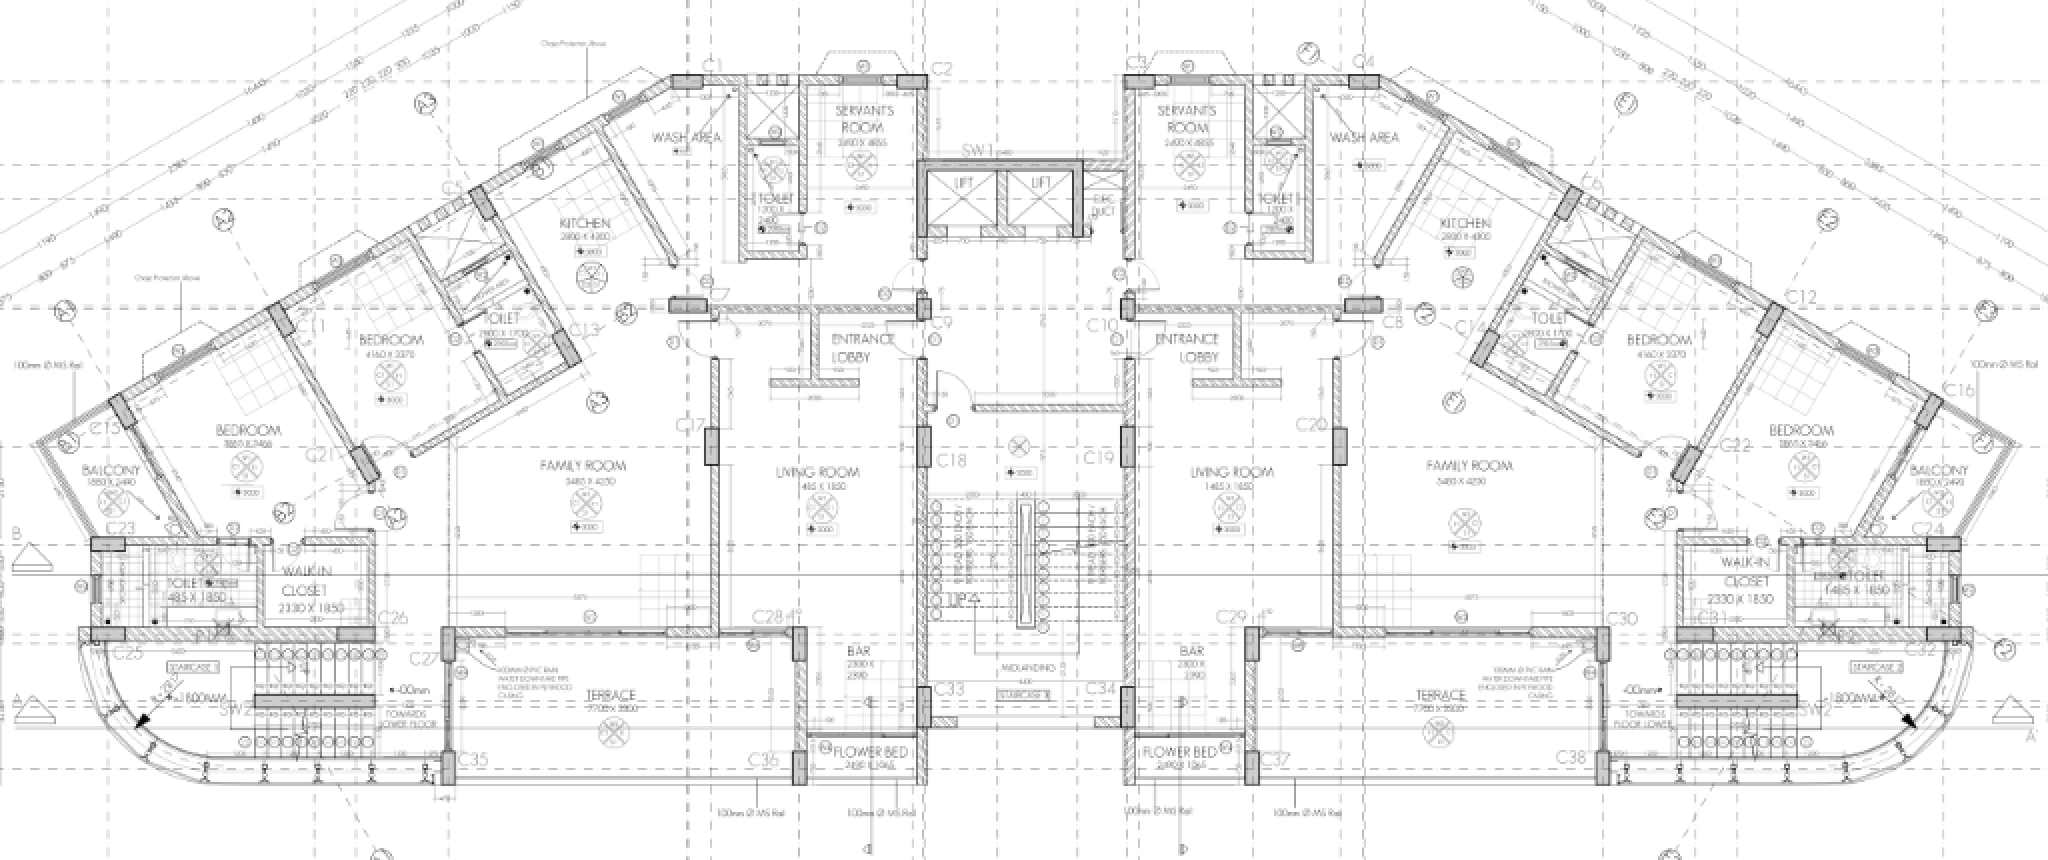 ah - residential building - working drawing